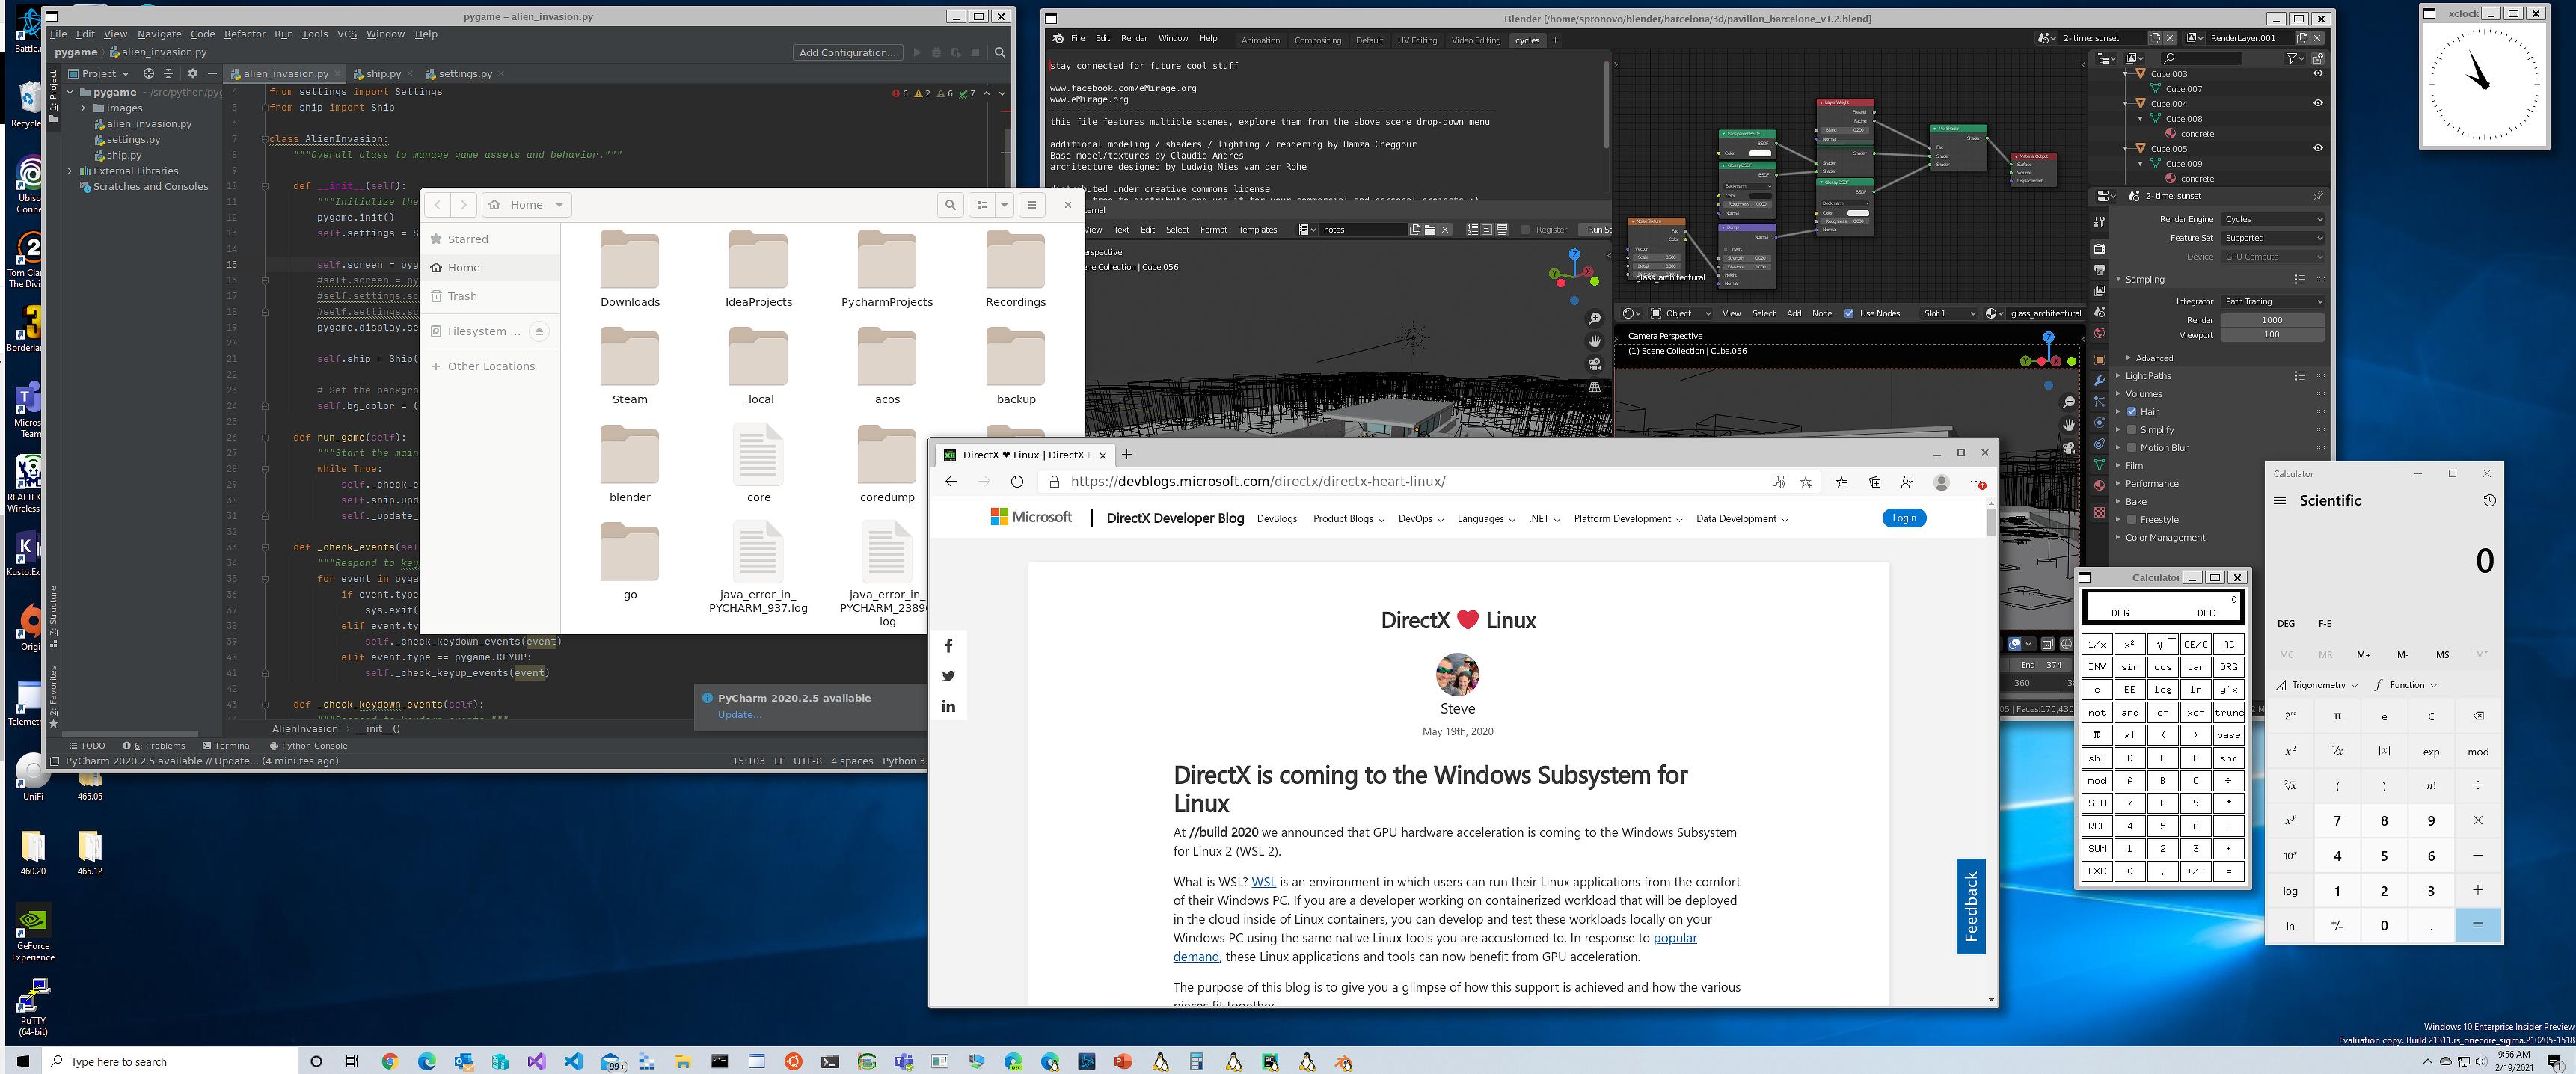 wslgintegrateddesktop.png